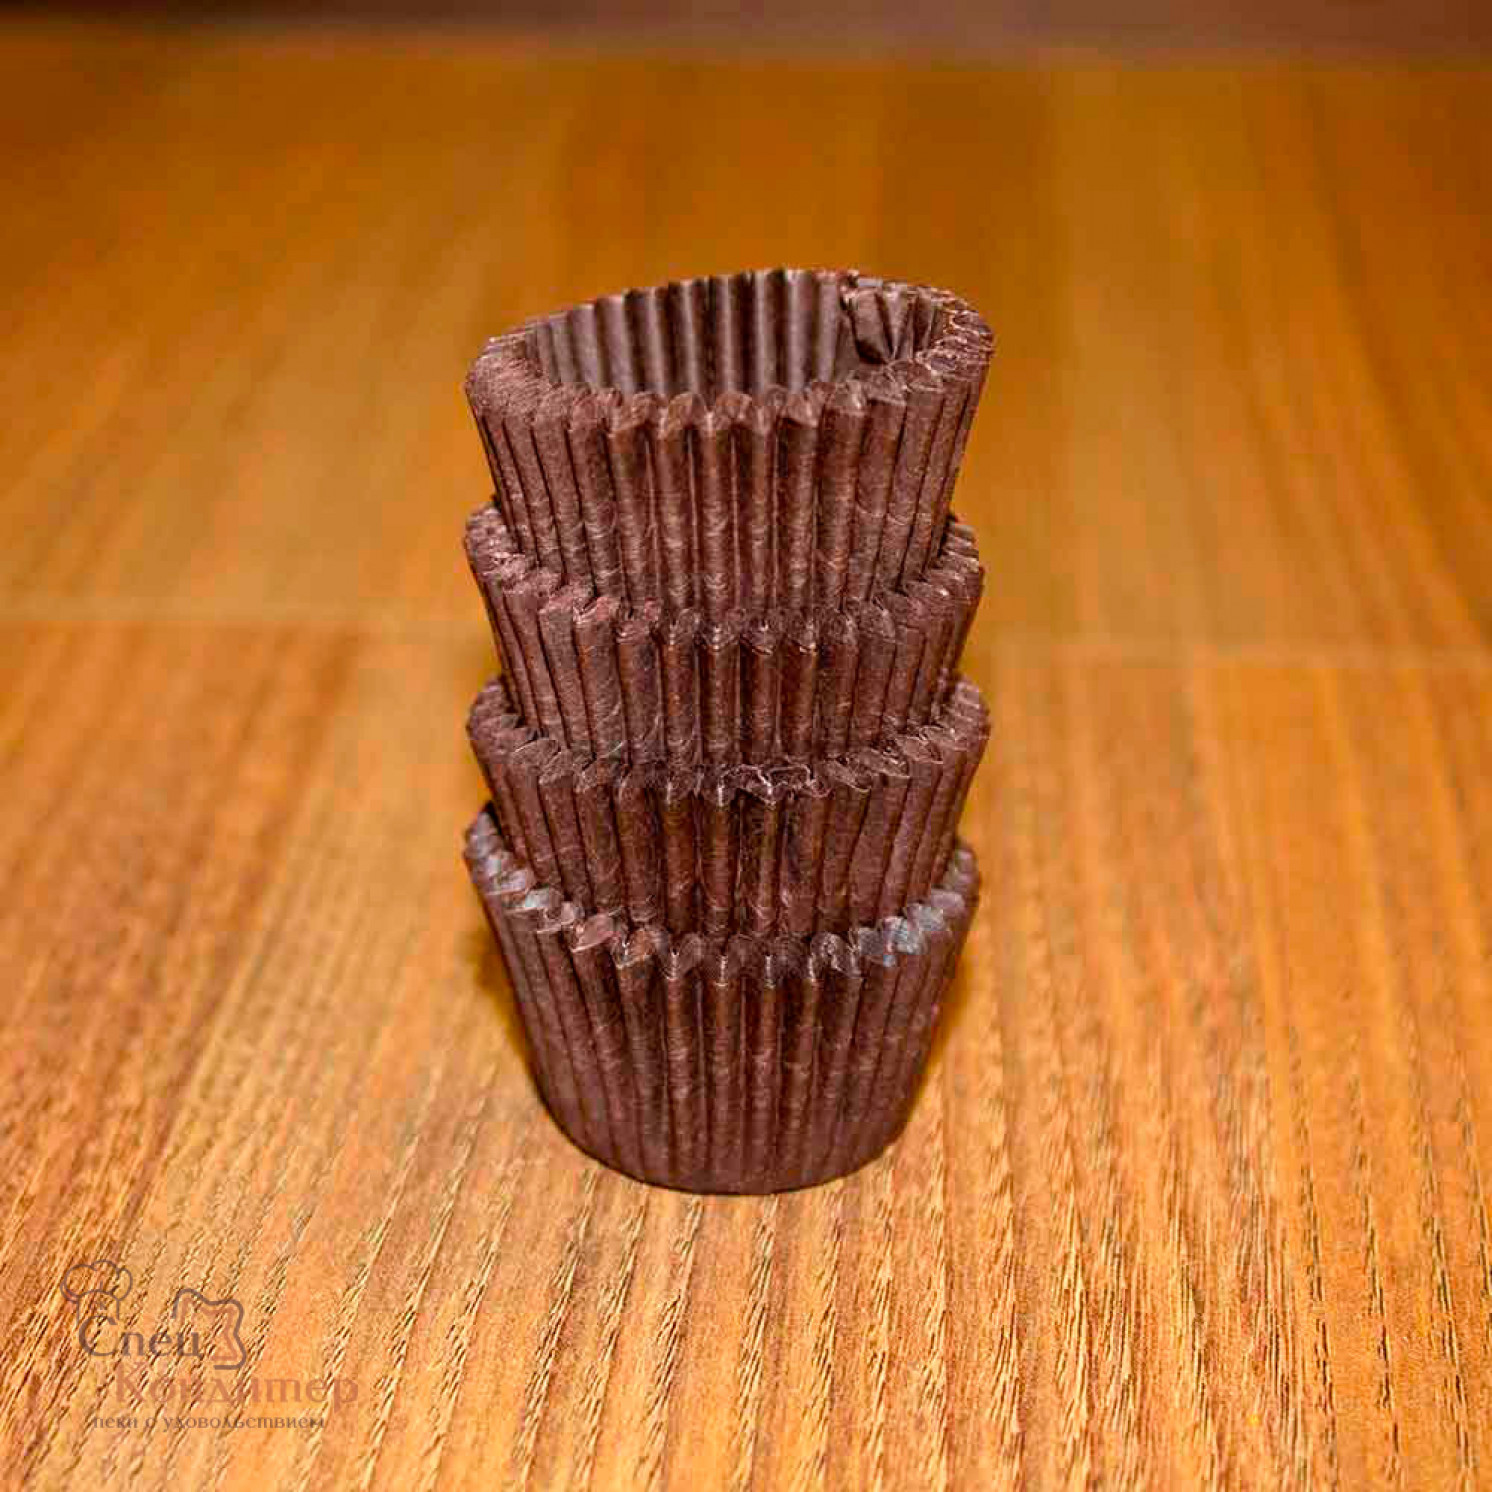 Тарталетки круг 3В (коричневая), 30*24 мм, 100 шт/уп.